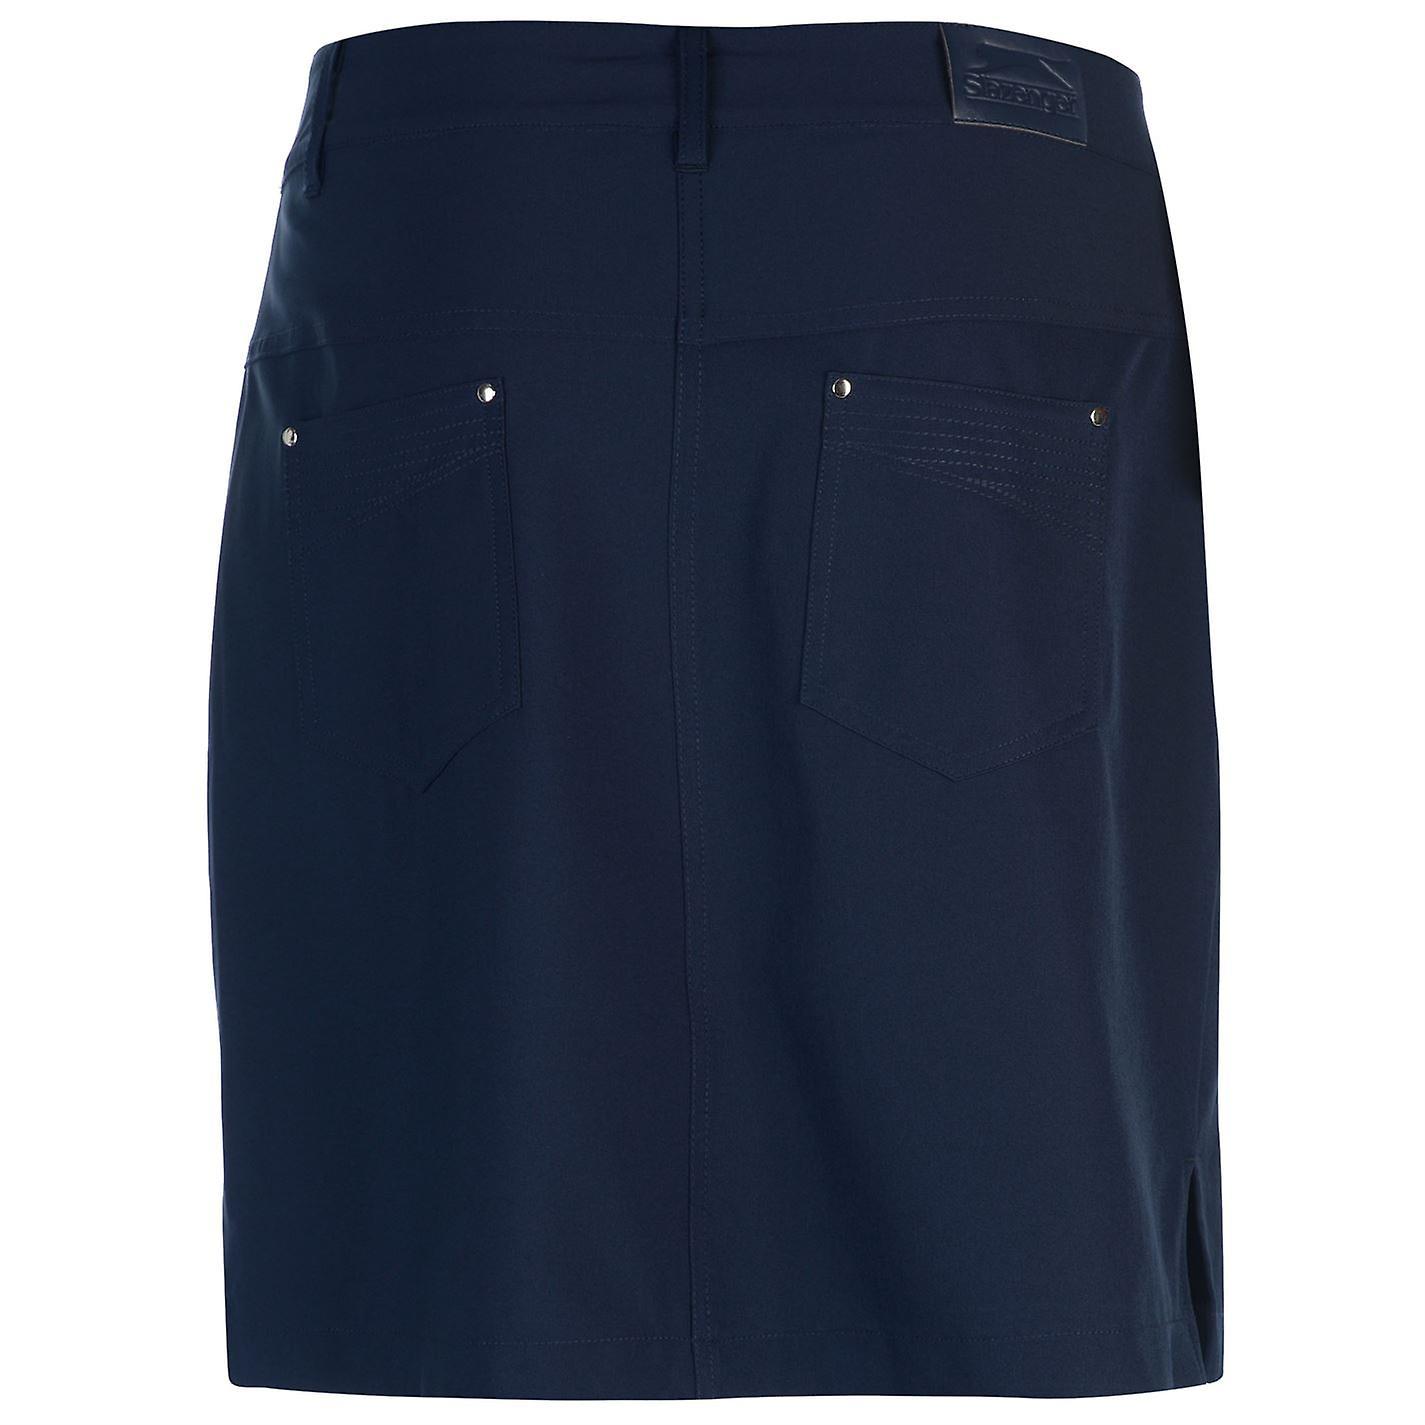 Slazenger Womens Golf Skort Zip Mesh Standard Fit